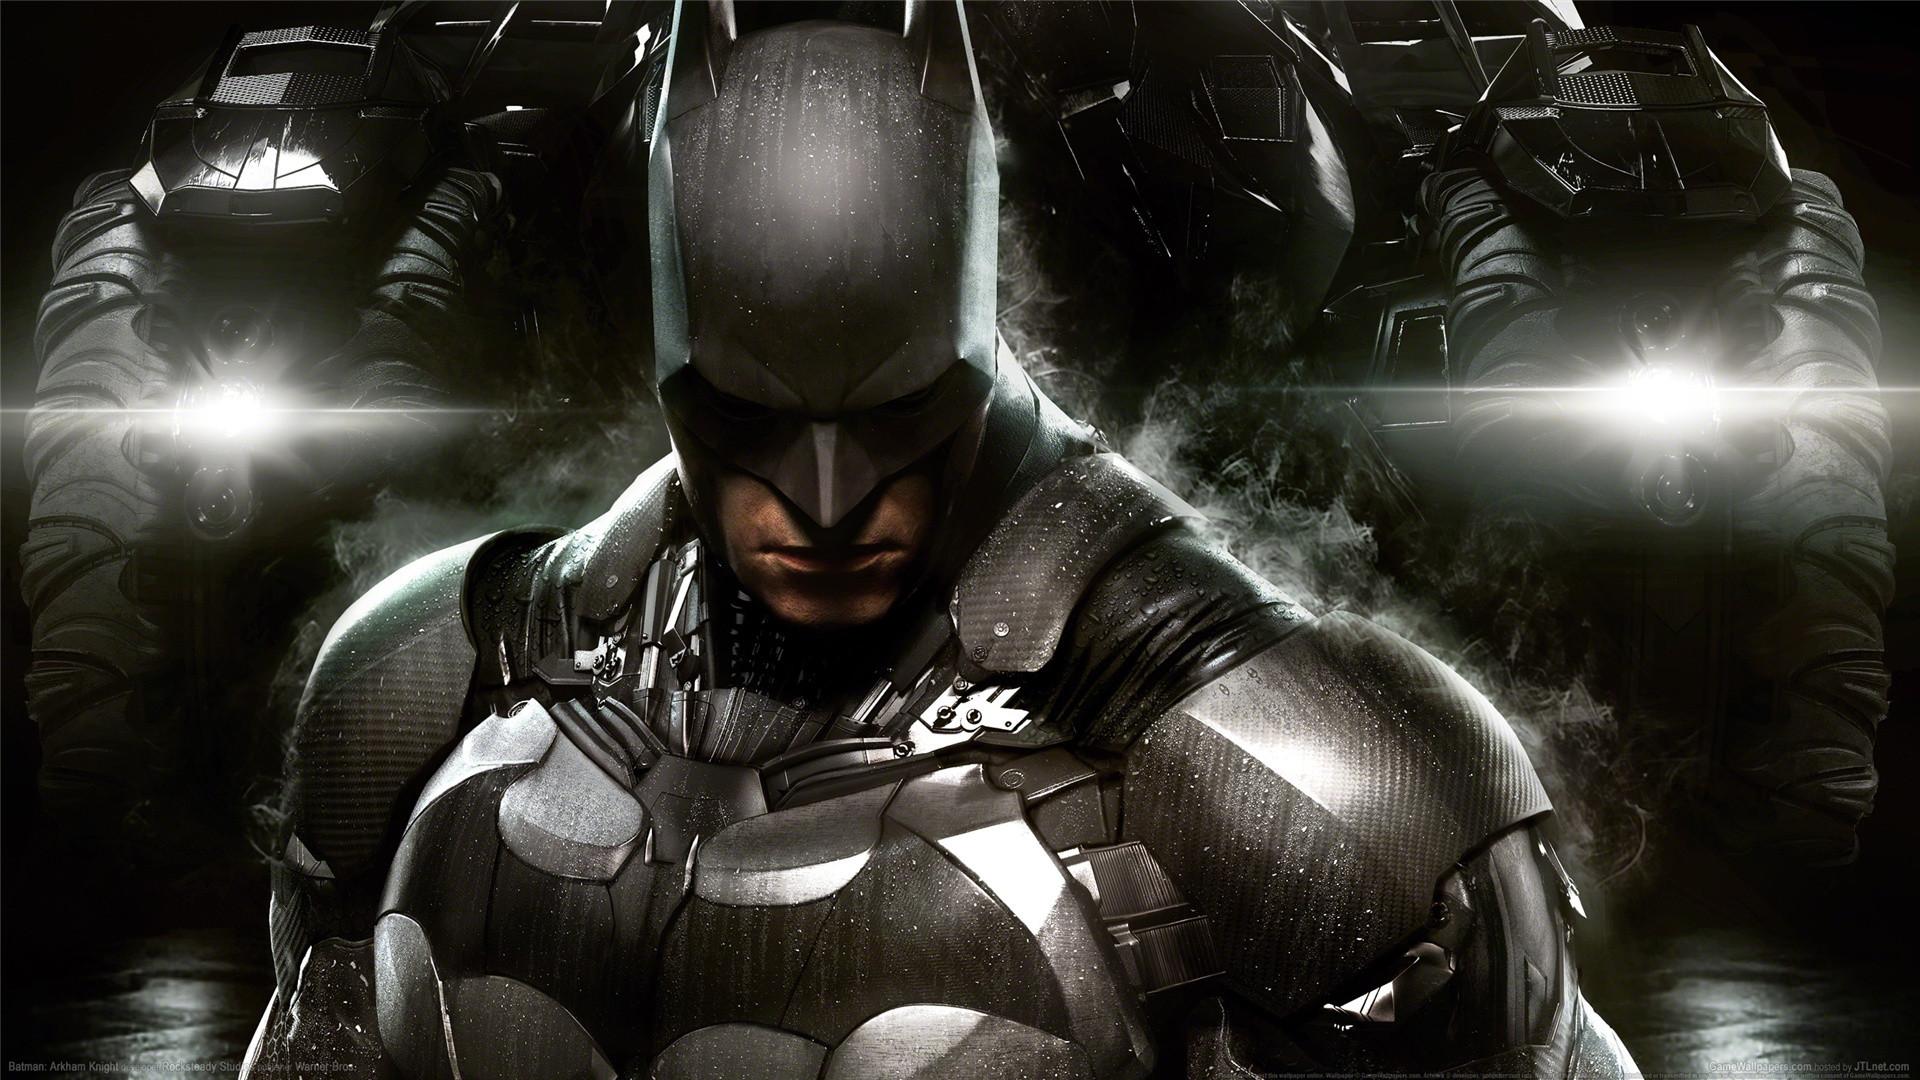 Best 20+ Batman arkham knight download ideas on Pinterest   Armadura de  espuma, capacete Pepakura and Máscara de motocicleta